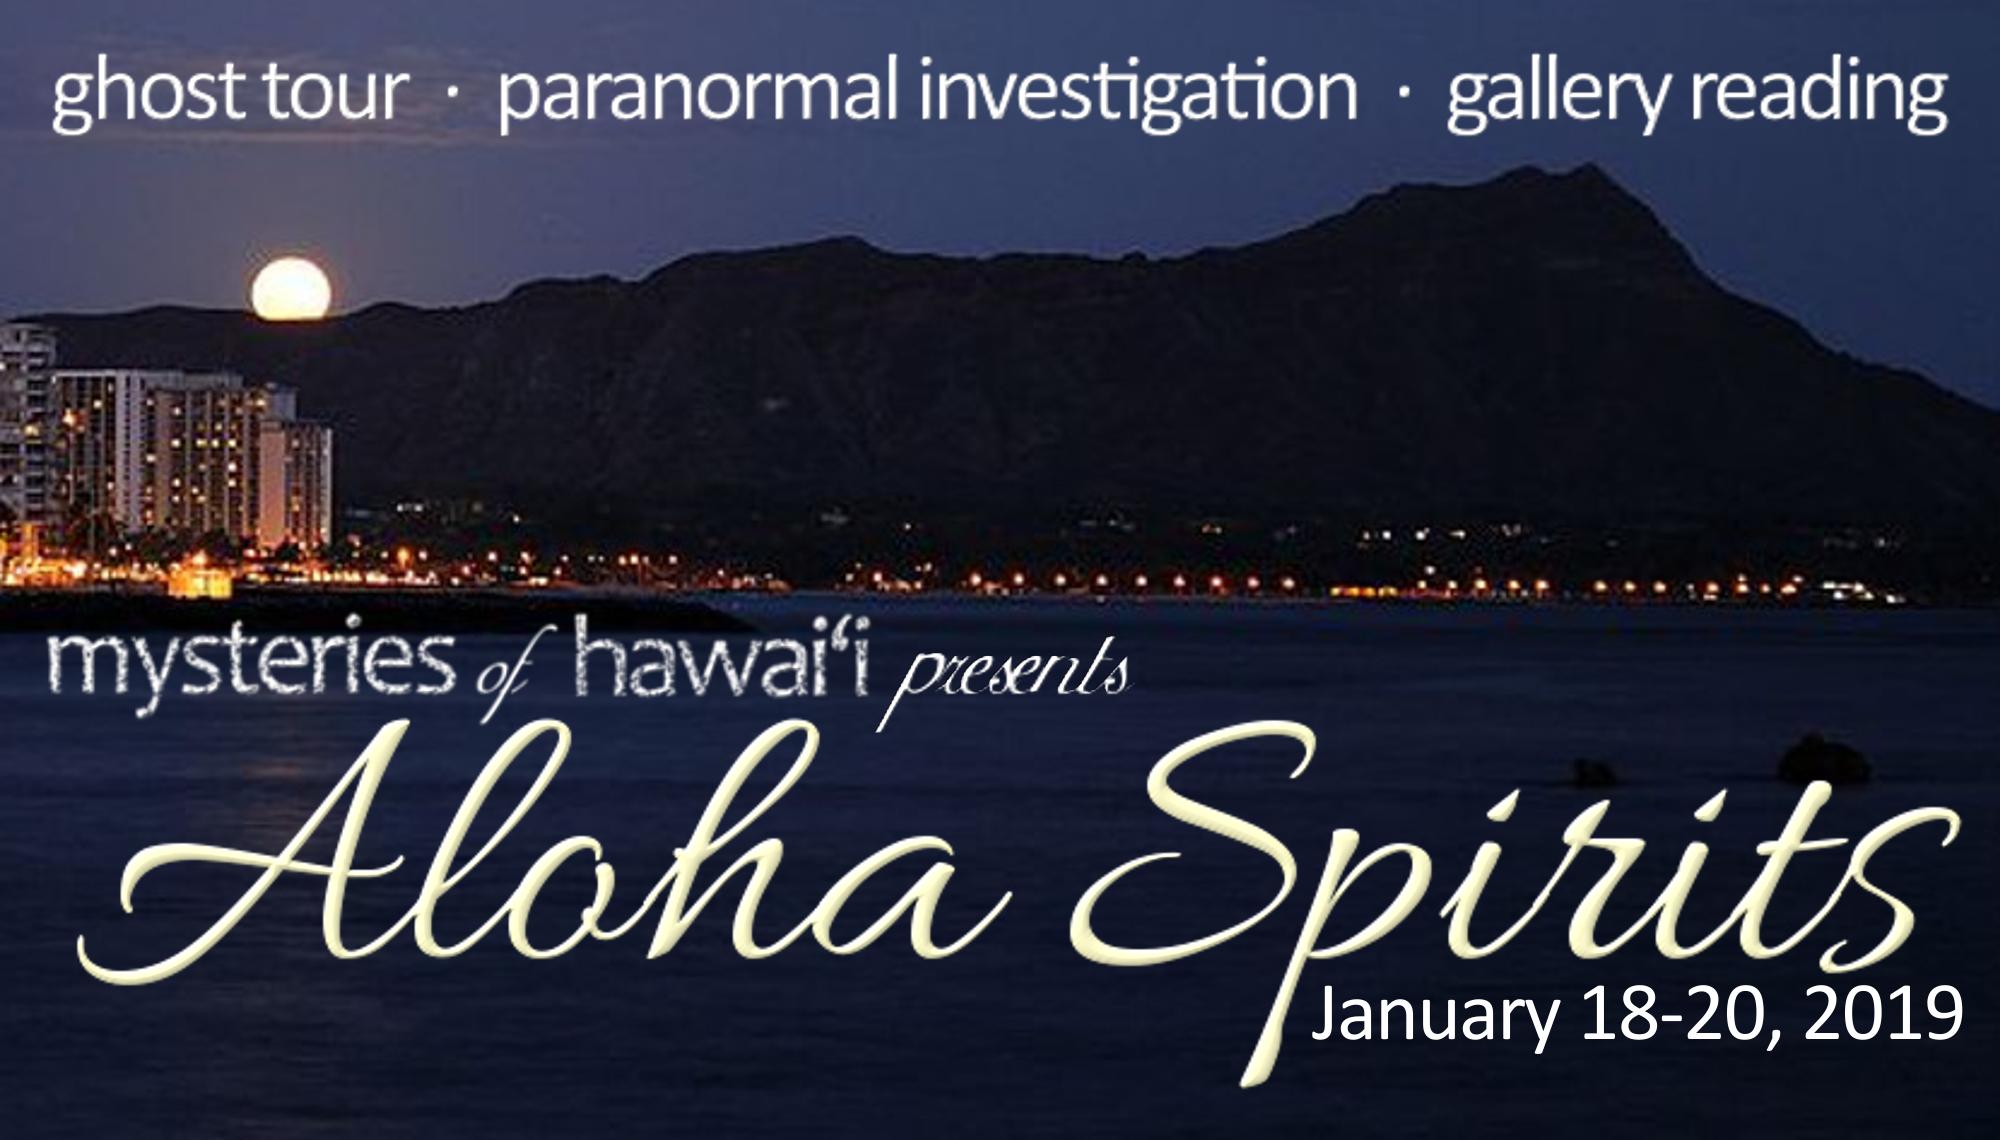 Mysteries of Hawaii presents Aloha Spirits with Scott Porter and Stephanie Burke